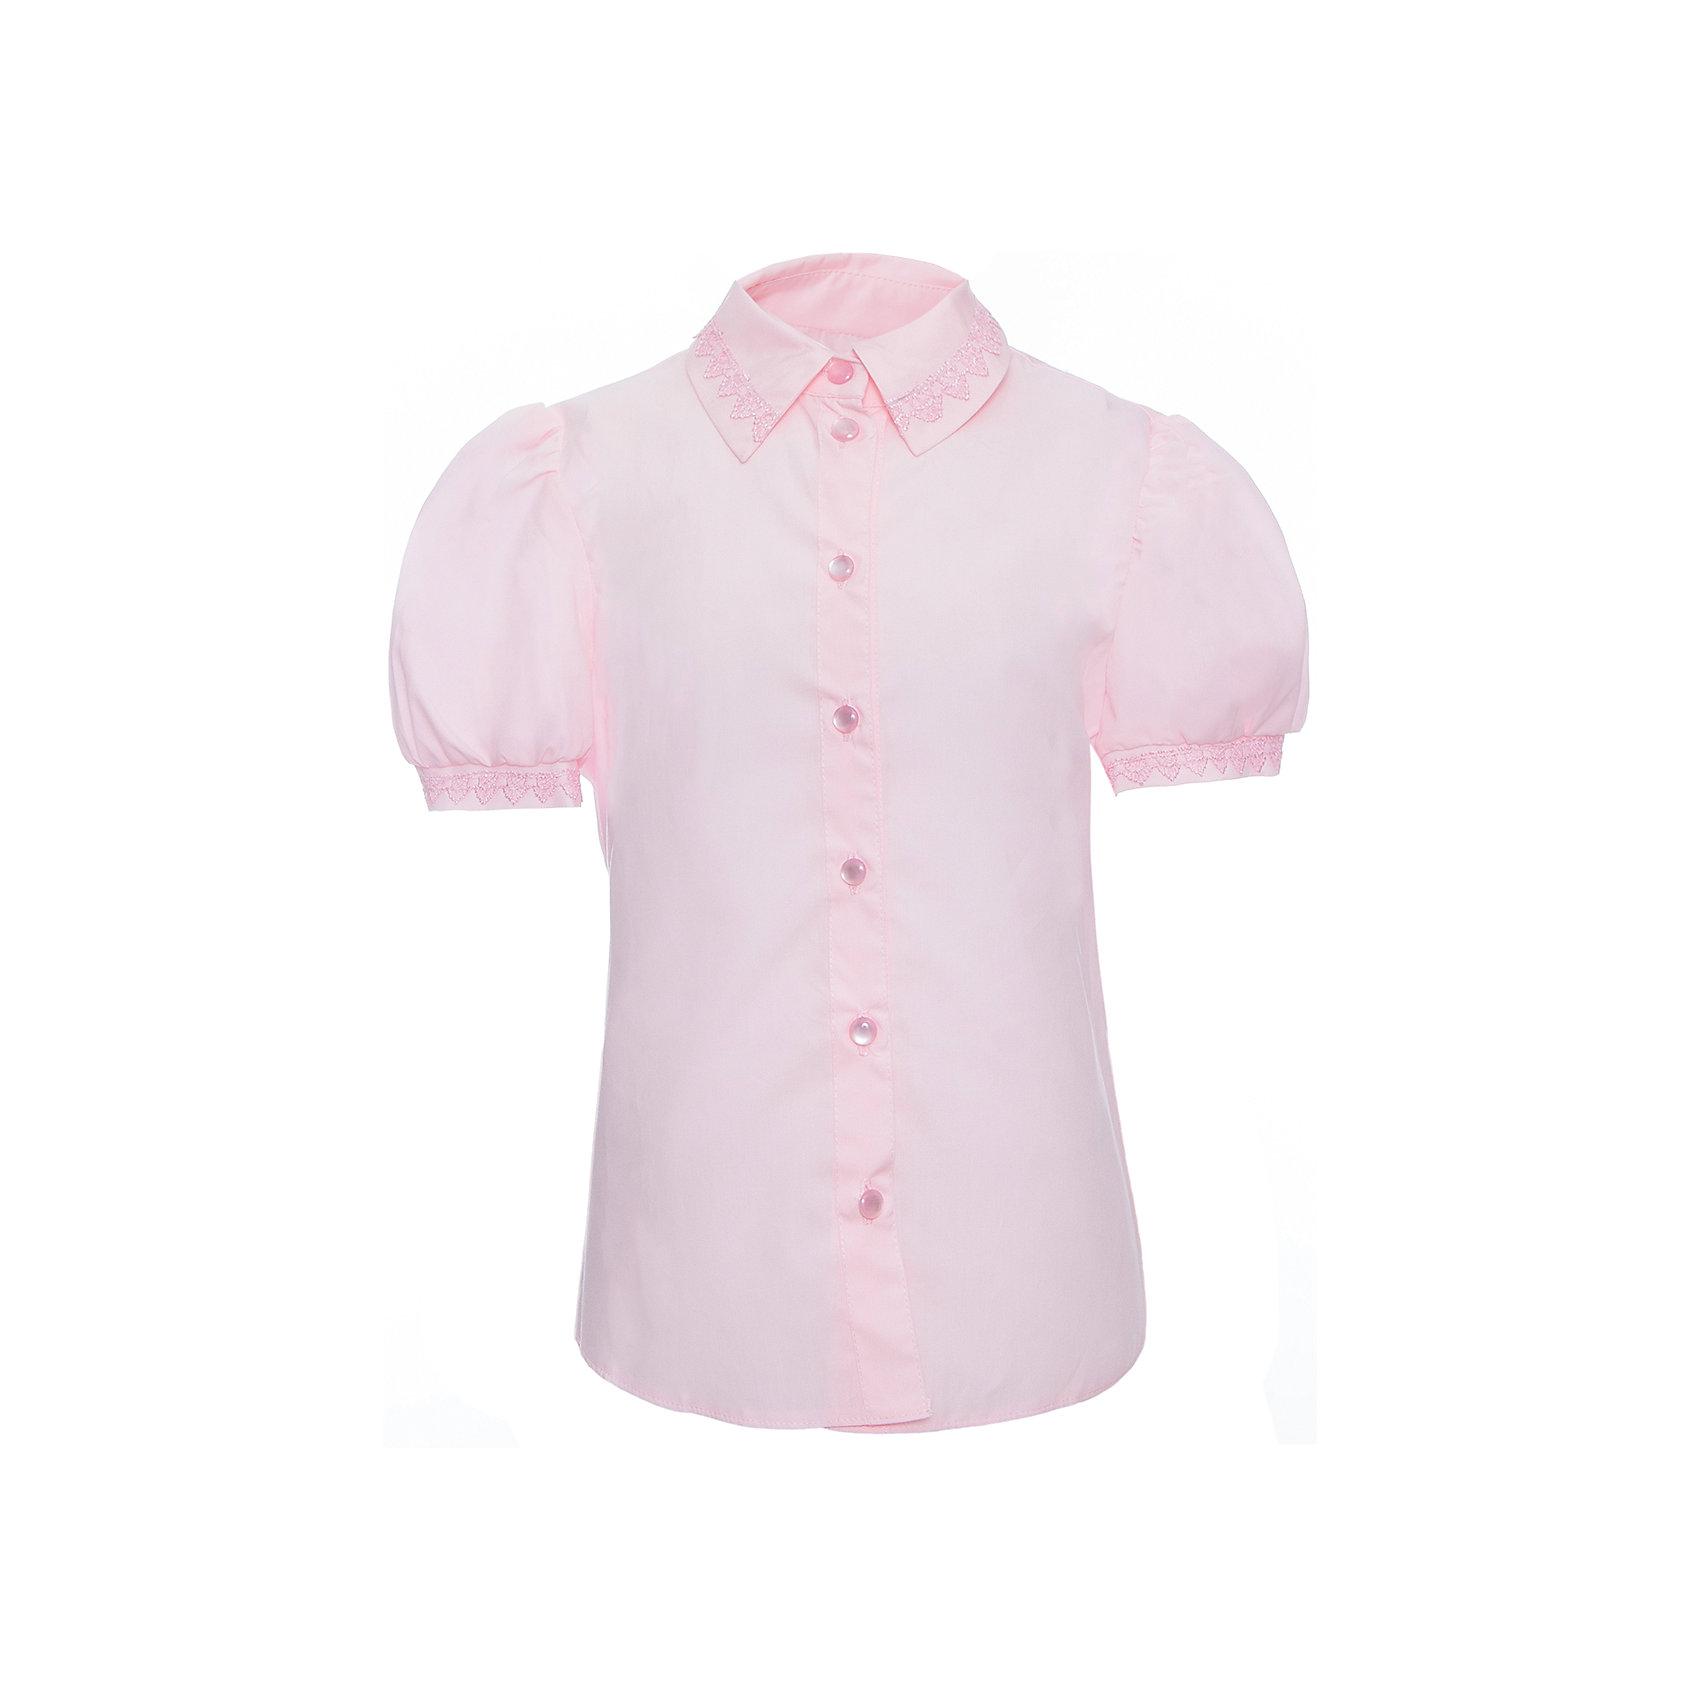 Блузка для девочки СменаБлузки и рубашки<br>Блузка для девочки от известного бренда Смена<br><br>Состав:<br>35%-хлопок;65%-полиэстер<br><br>Ширина мм: 186<br>Глубина мм: 87<br>Высота мм: 198<br>Вес г: 197<br>Цвет: розовый<br>Возраст от месяцев: 132<br>Возраст до месяцев: 144<br>Пол: Женский<br>Возраст: Детский<br>Размер: 152,134,158,146,128,122,140<br>SKU: 4720325